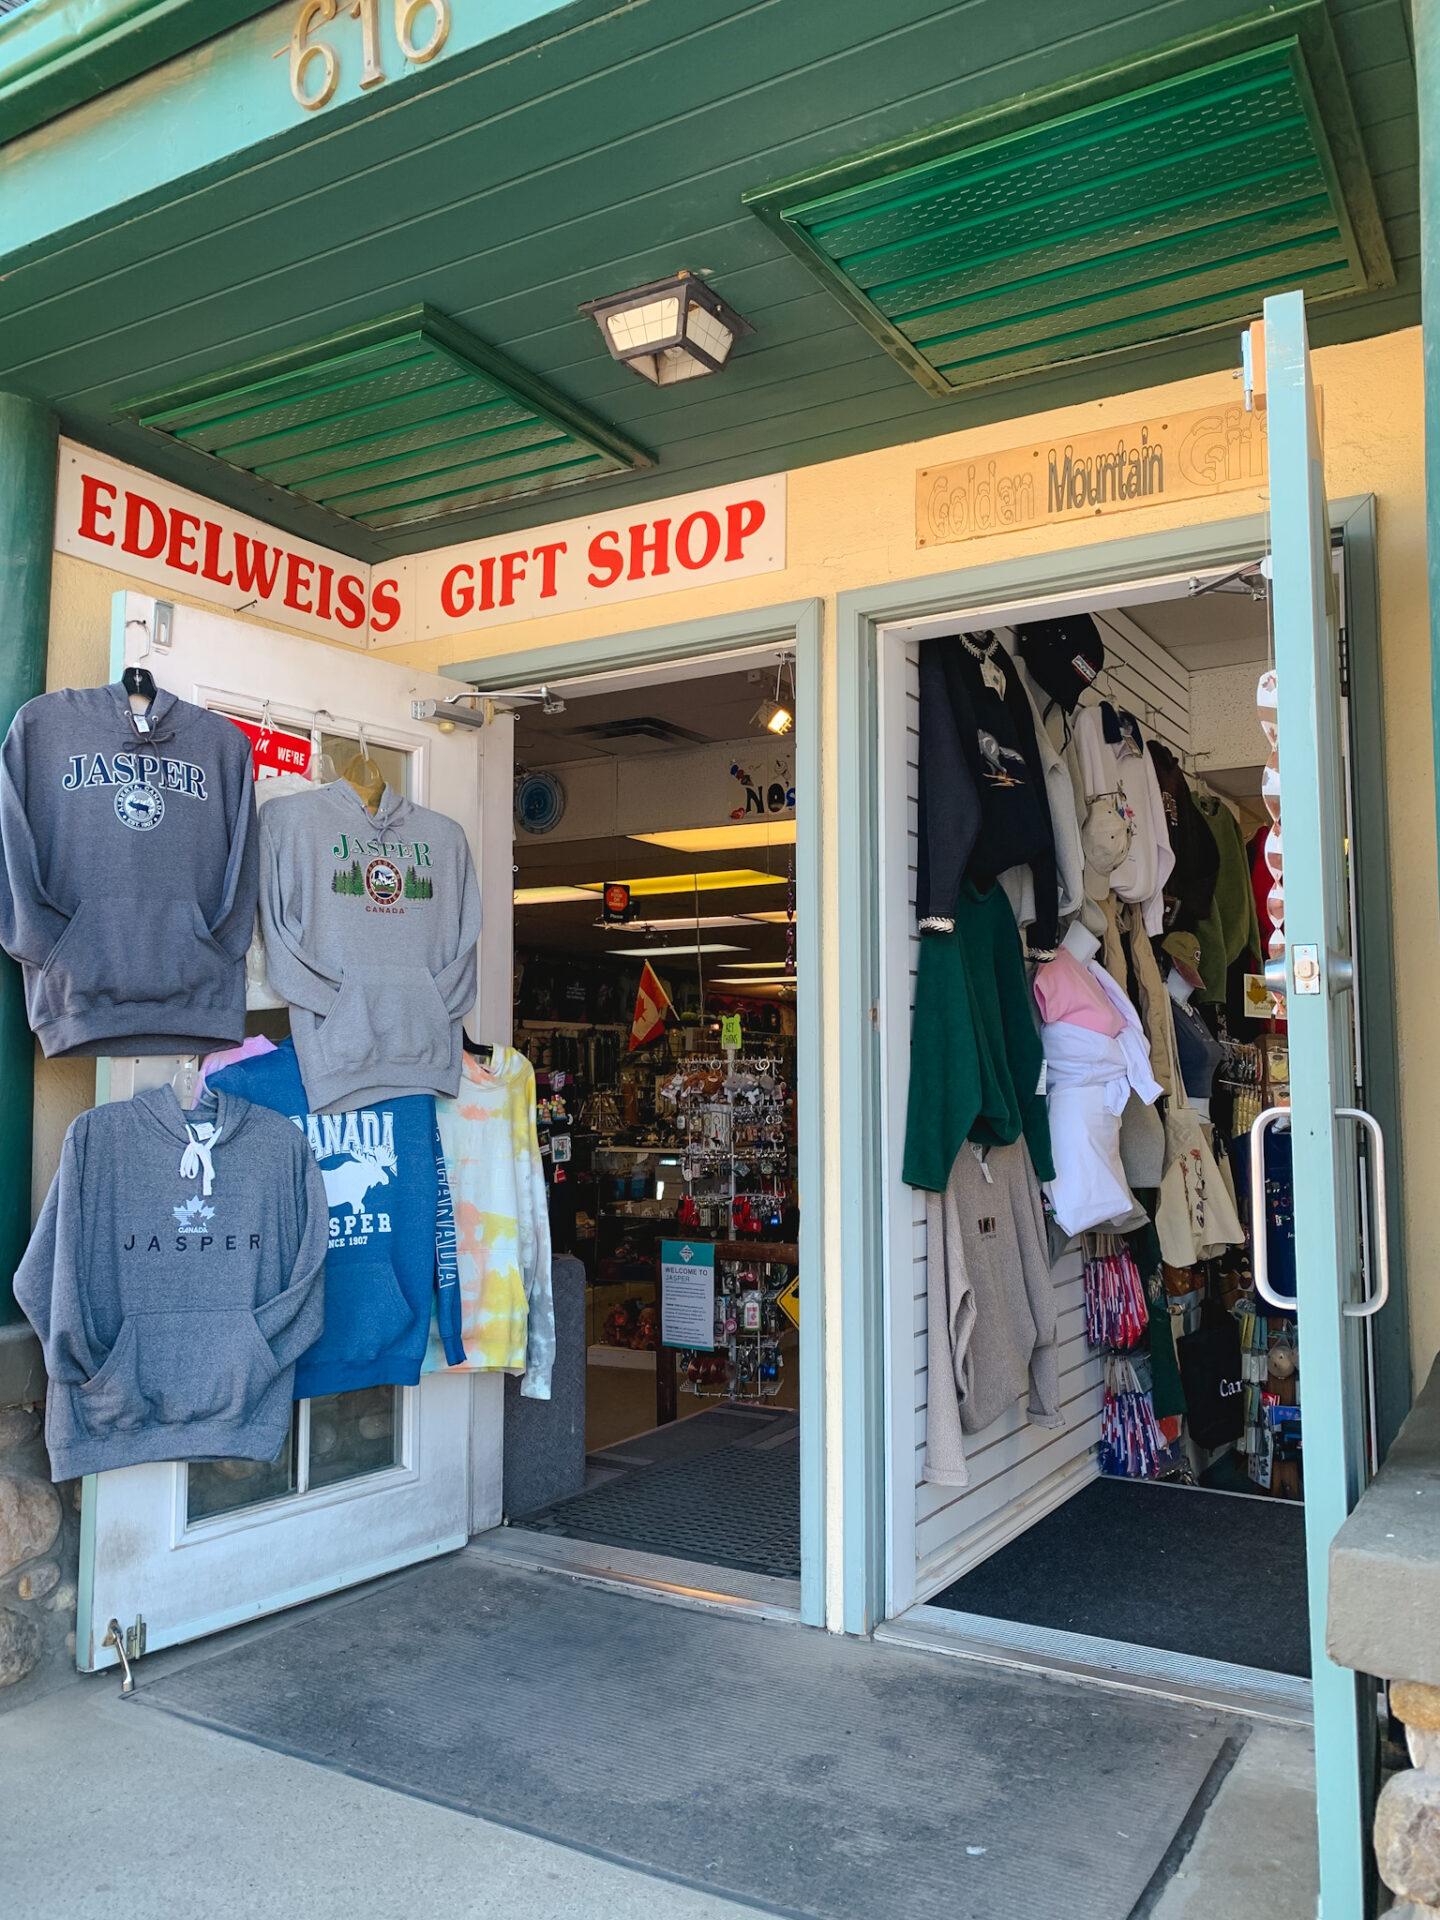 Gift shops in Jasper, Alberta